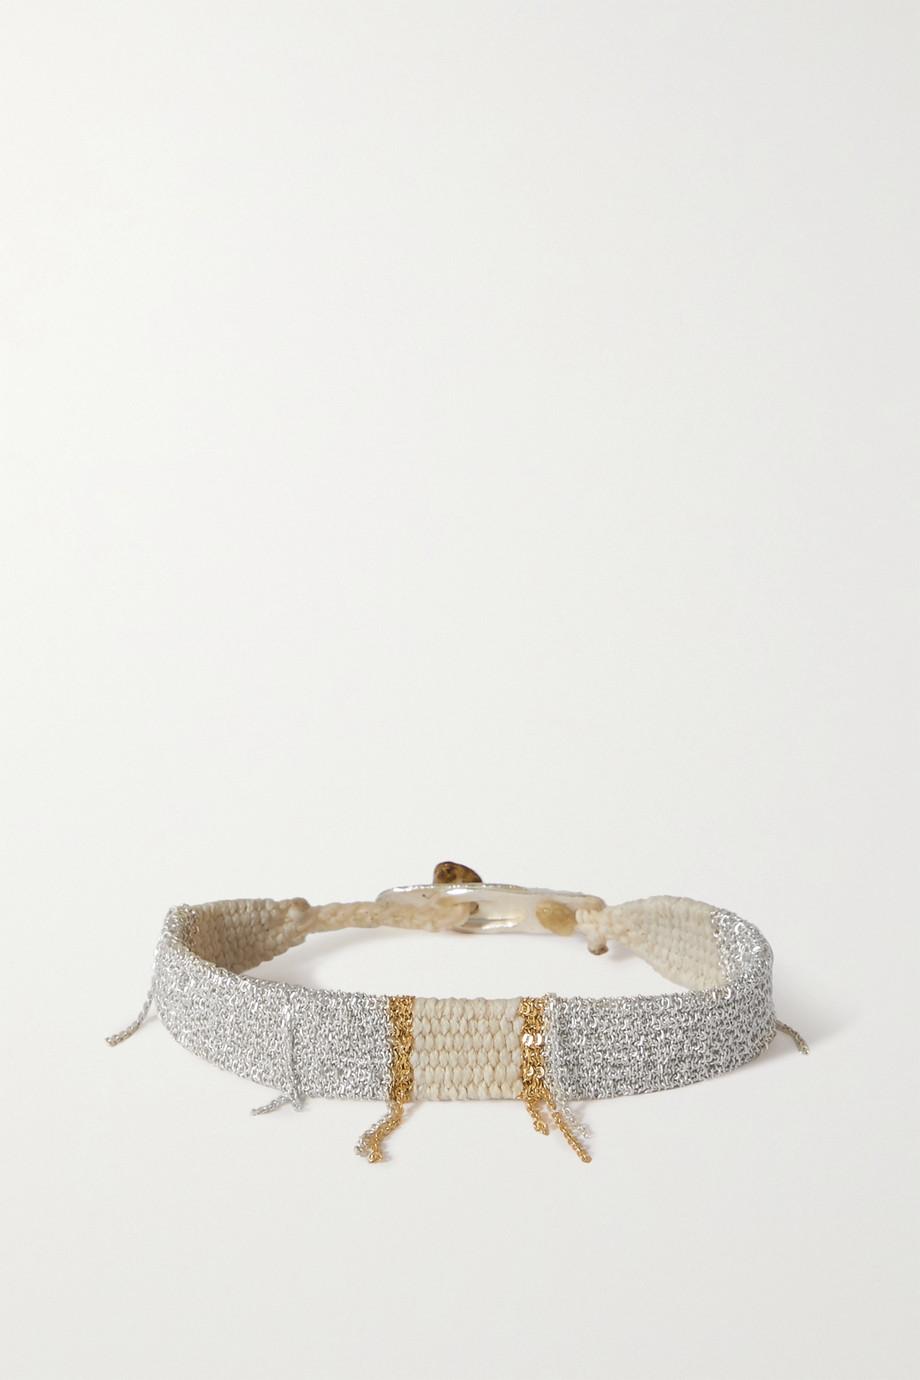 Katia Alpha Woven cord, gold vermeil and silver bracelet